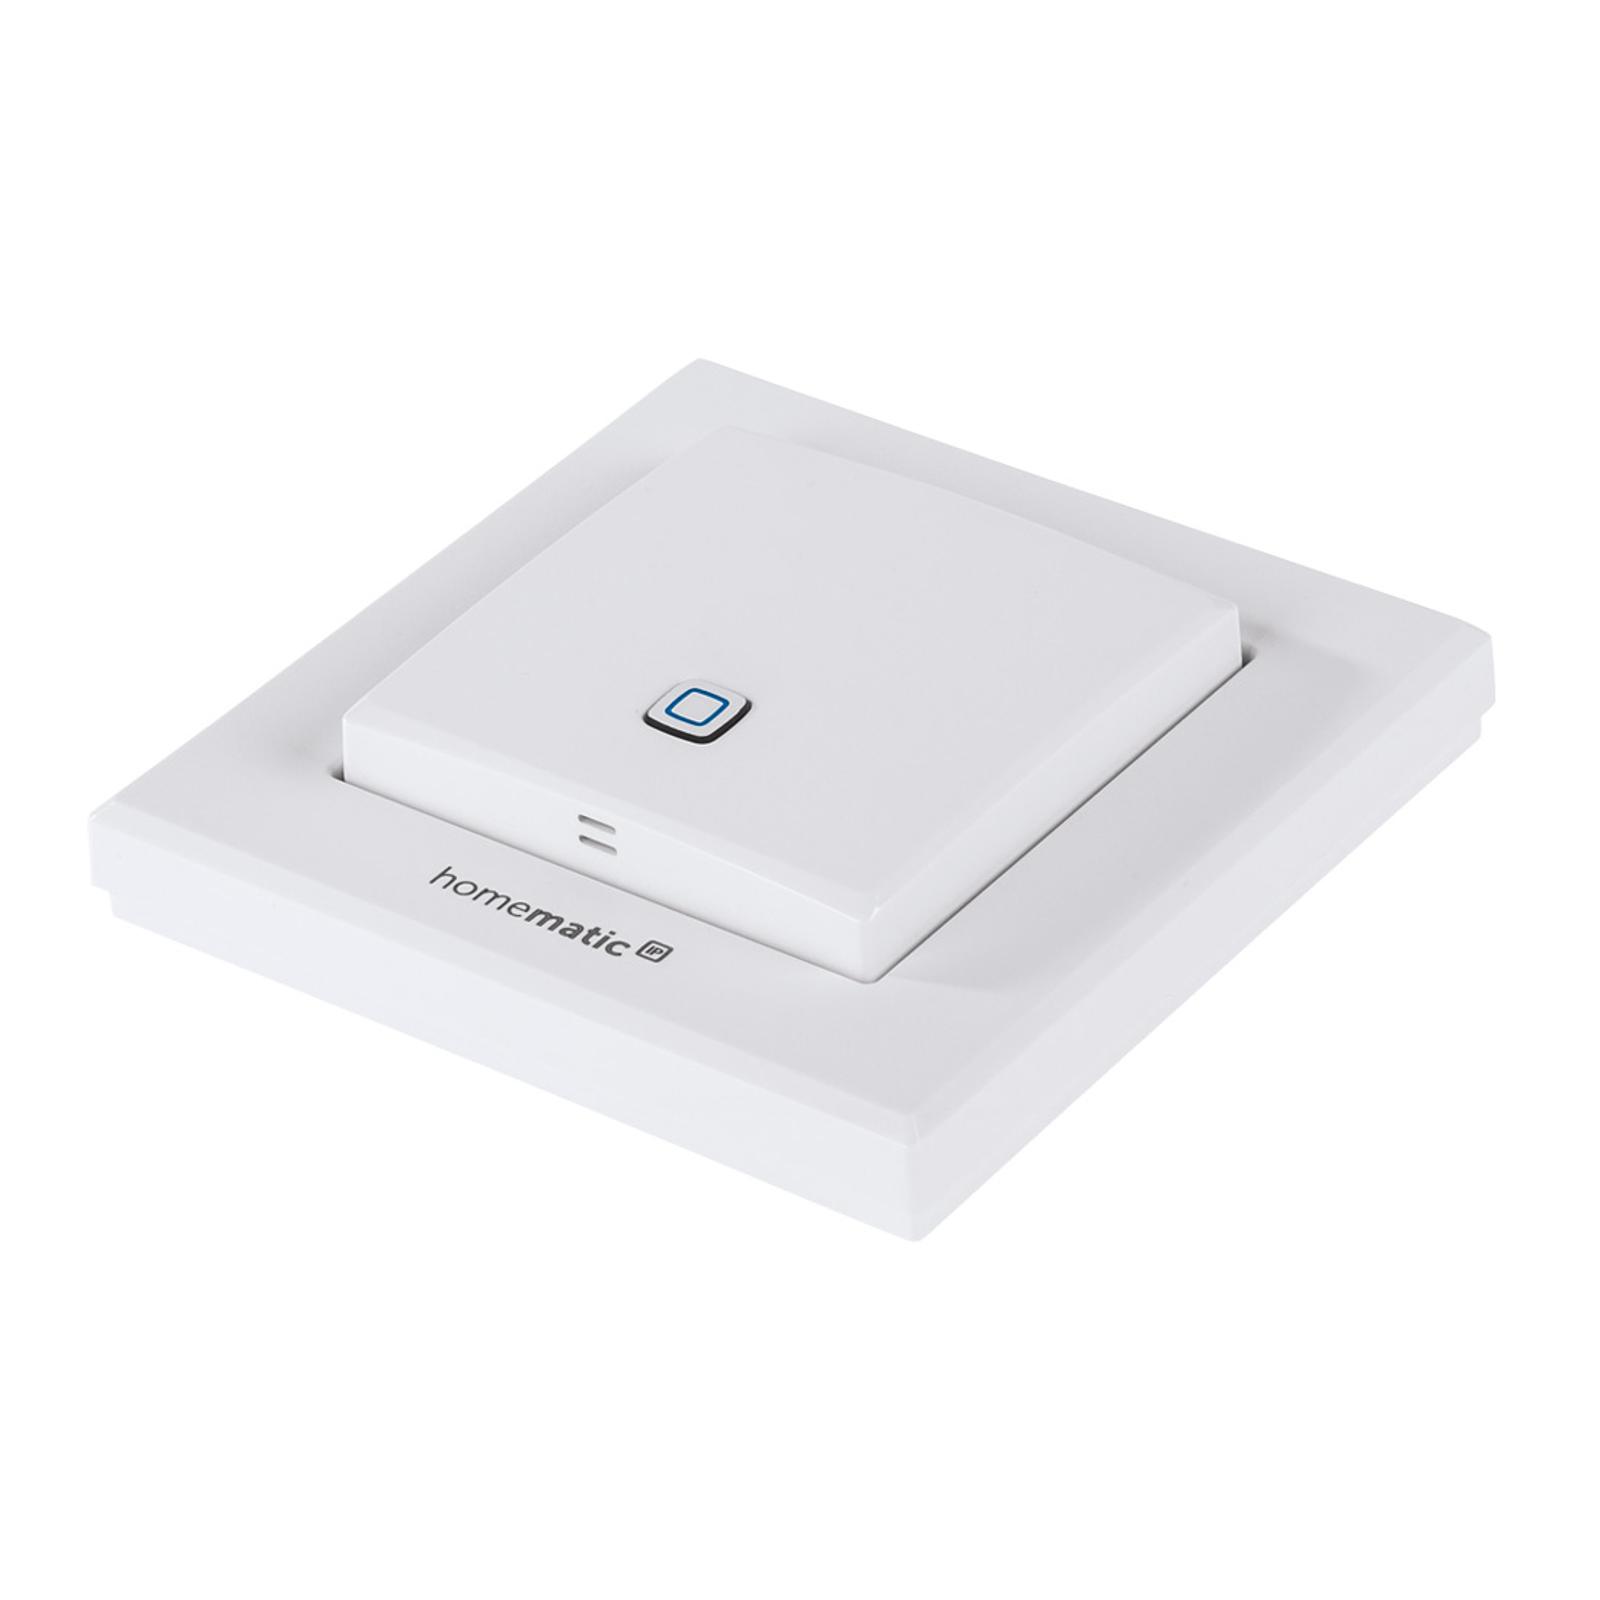 Homematic IP czujnik temperatury wewnętrzny